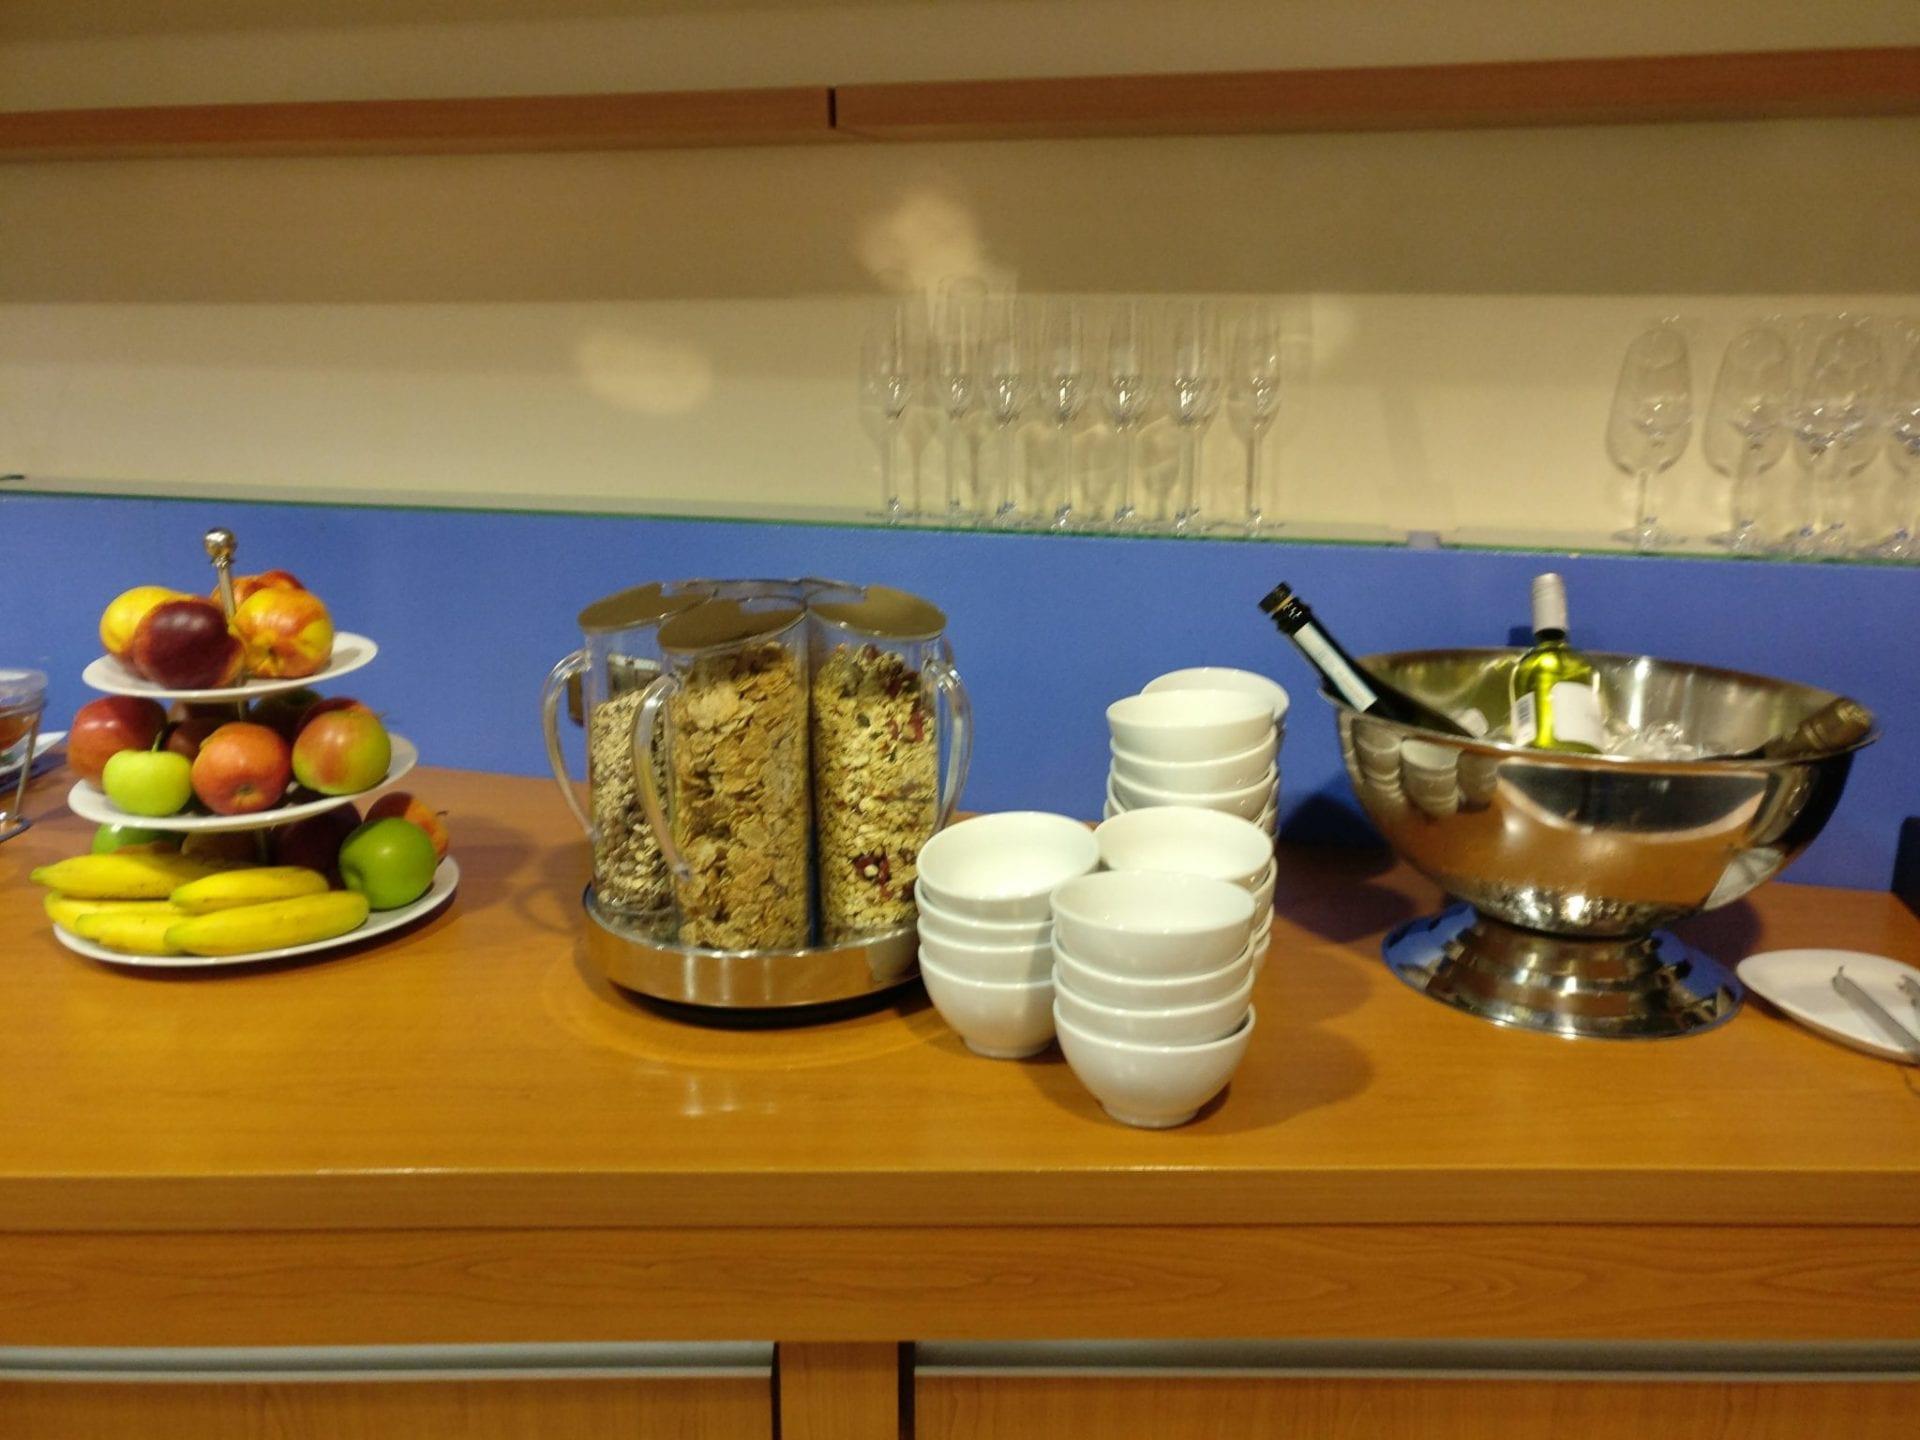 airberlin-lounge-duesseldorf-buffet-3